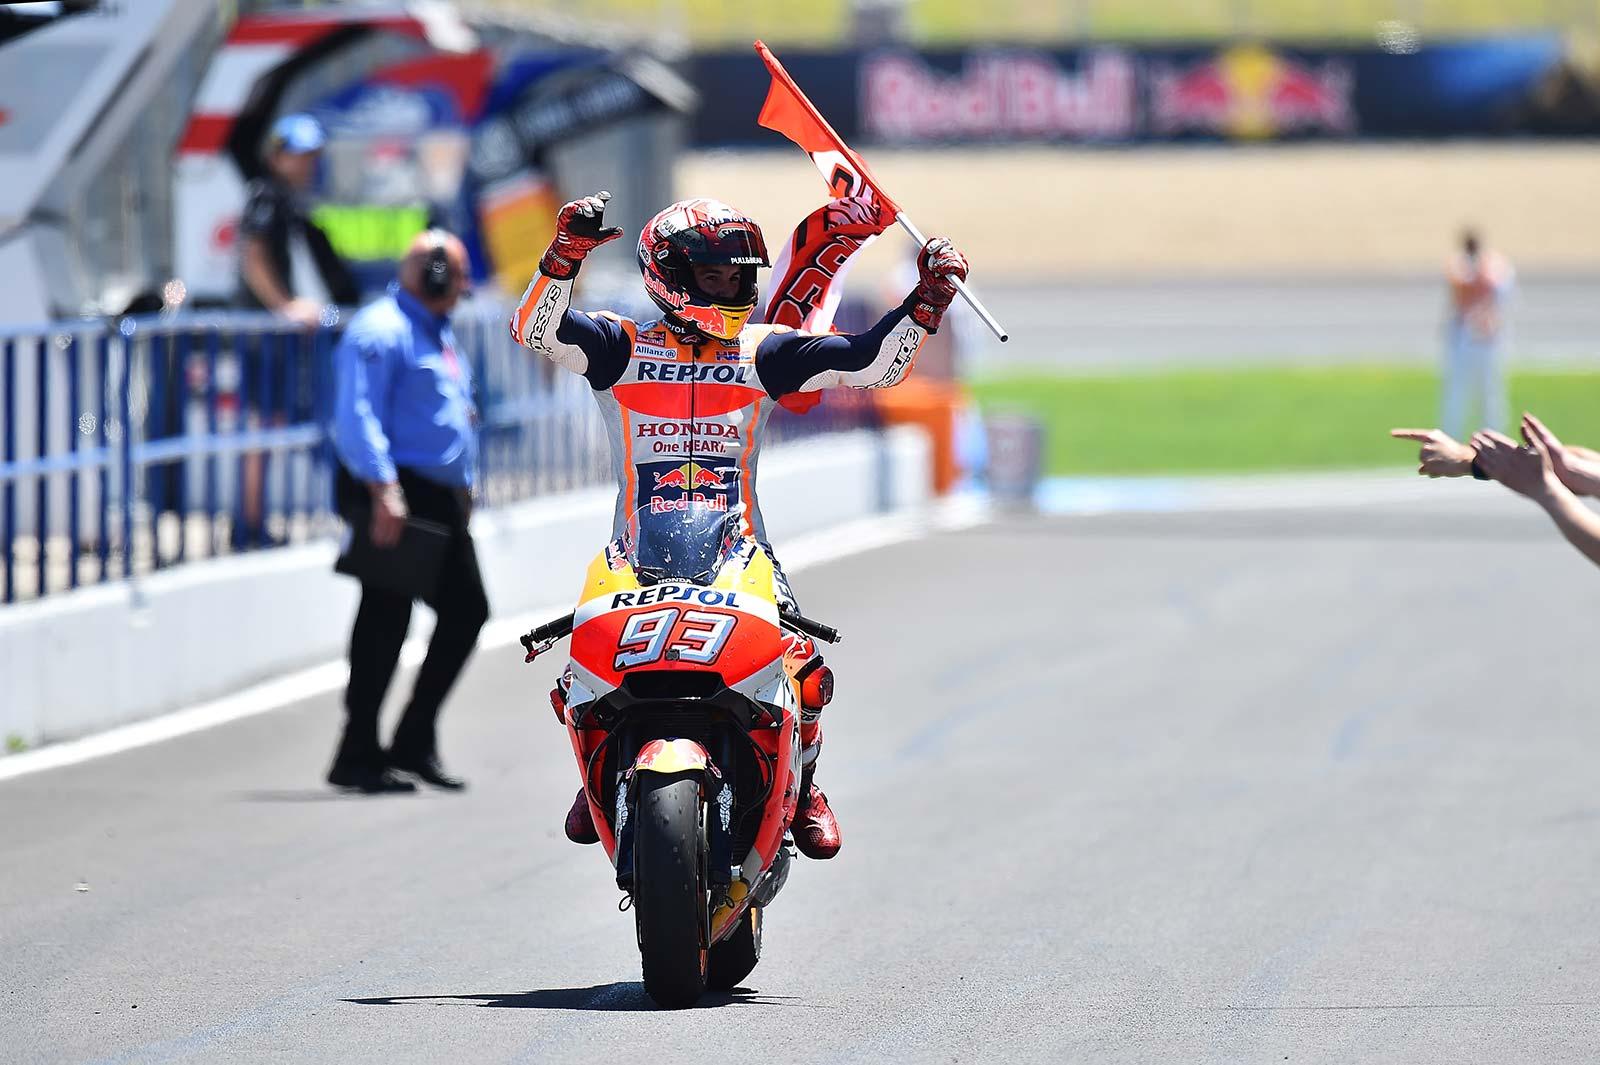 MotoGP – Marc Marquez on track to equal Casey Stoner